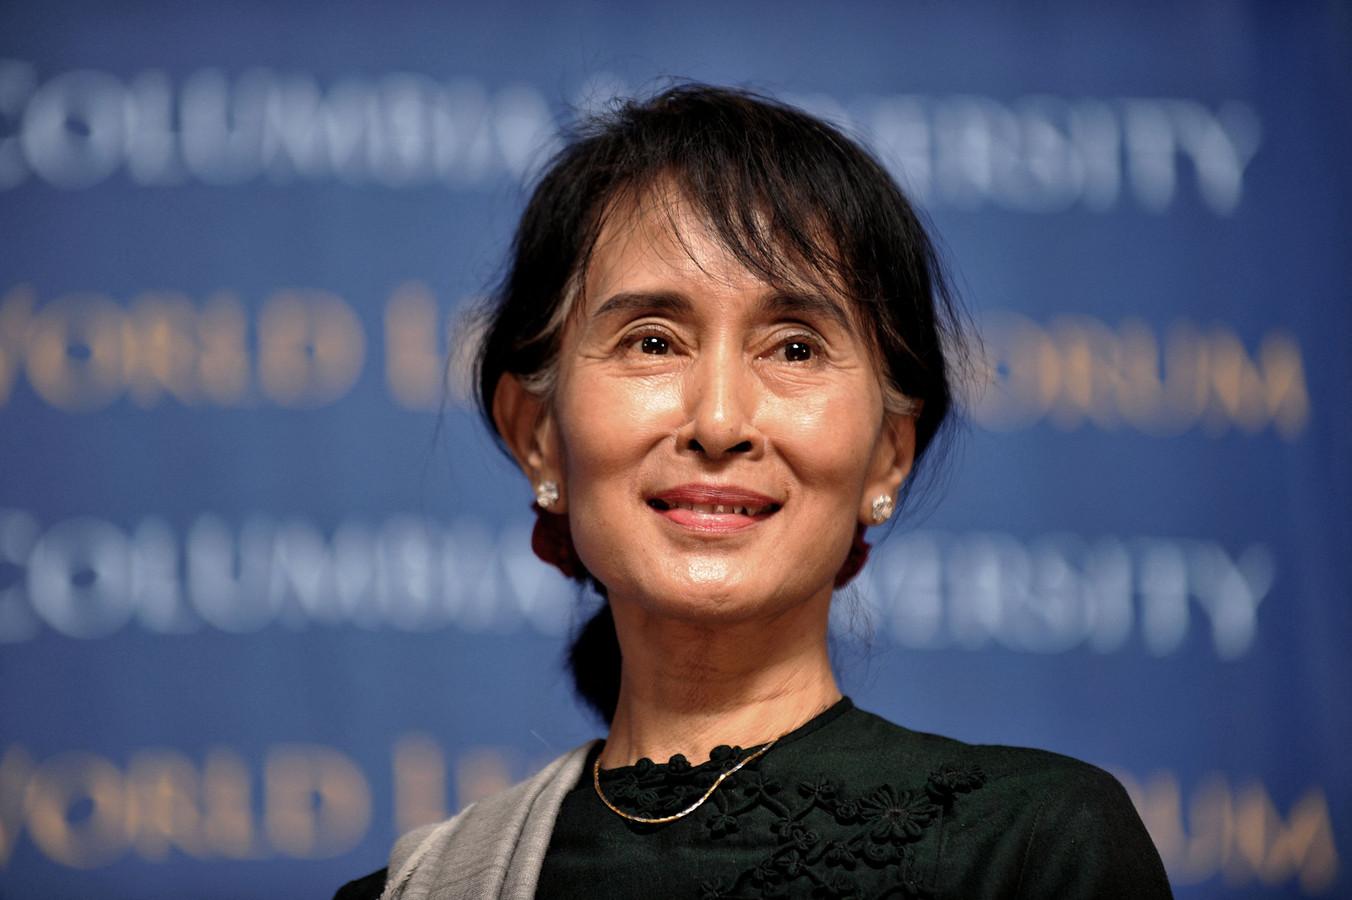 Aung San Suu Kyi op archiefbeeld.